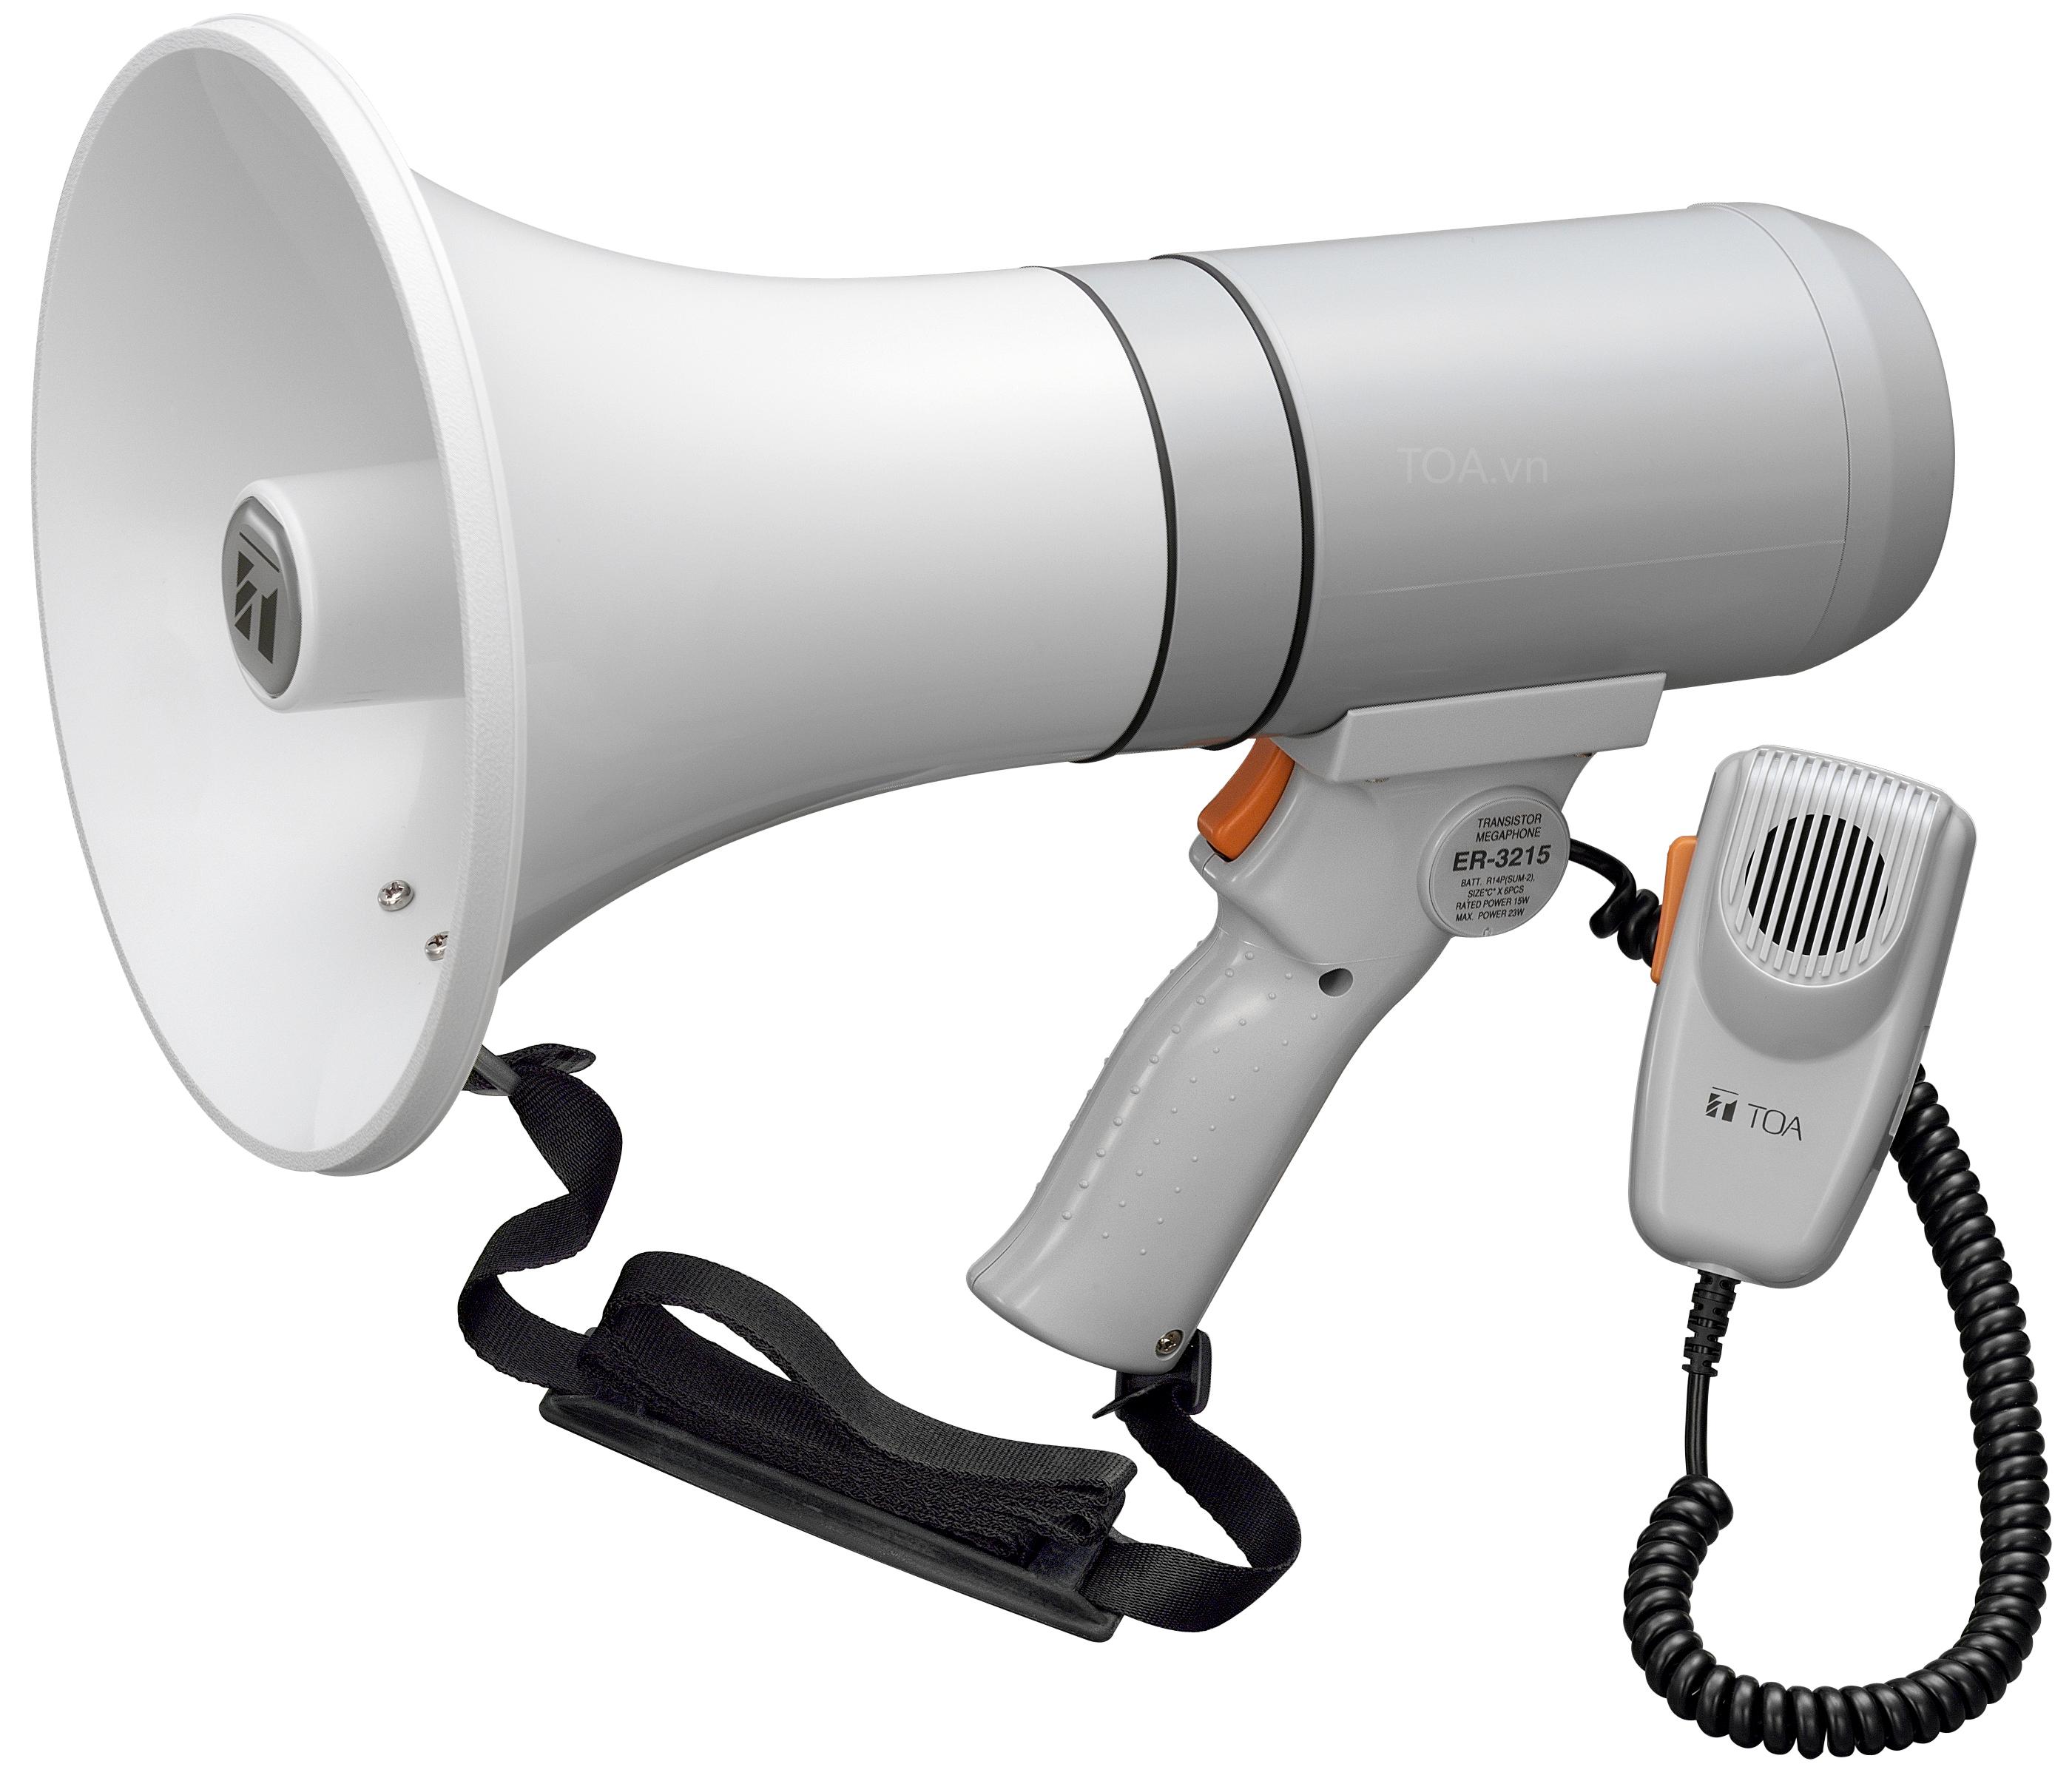 Megaphone kiểu cầm tay TOA ER-3215S, giá bán ER-3215S, megaphone cầm tay chính hãng TOA ER-3215S